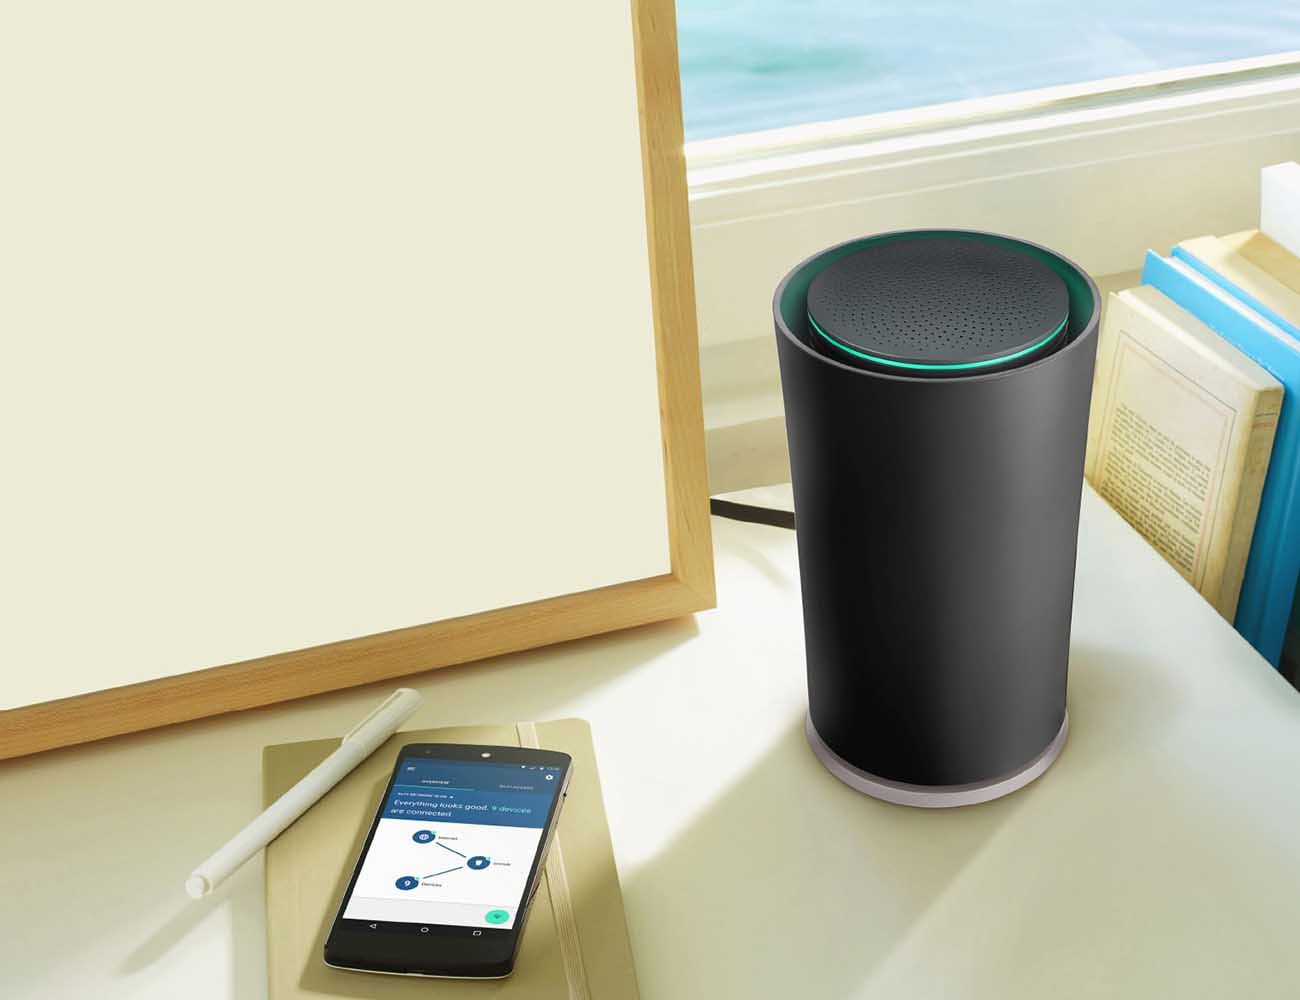 Google OnHub WiFi Router